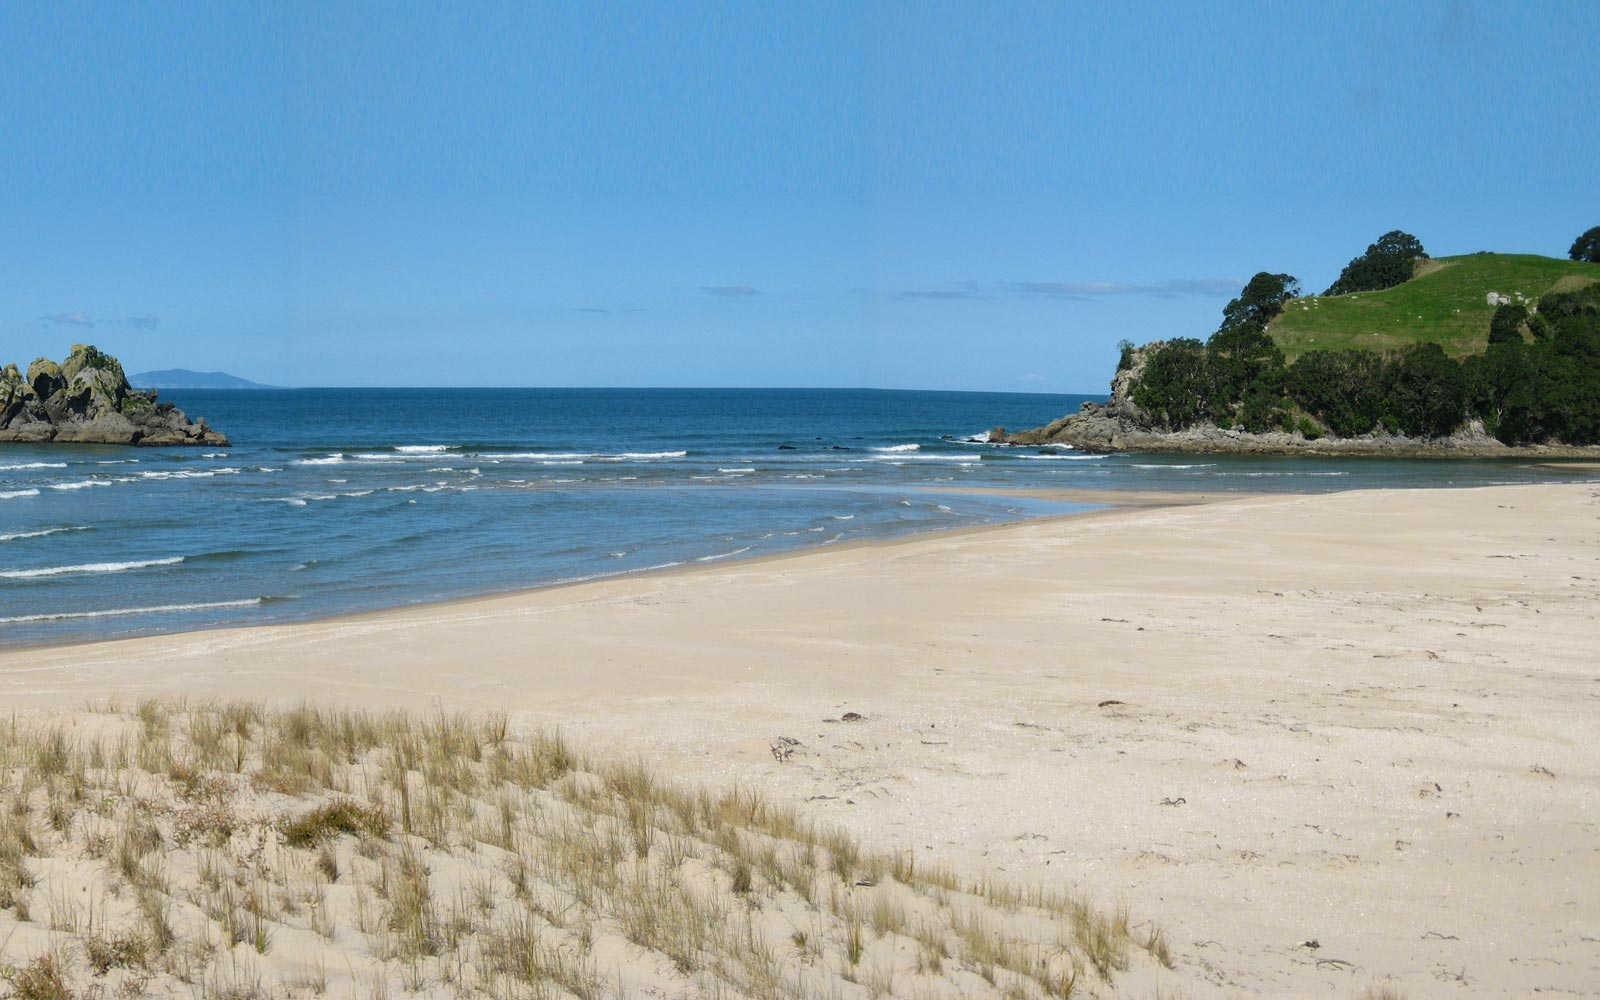 Opoutere Beach,New Zealand @World Beach Guide